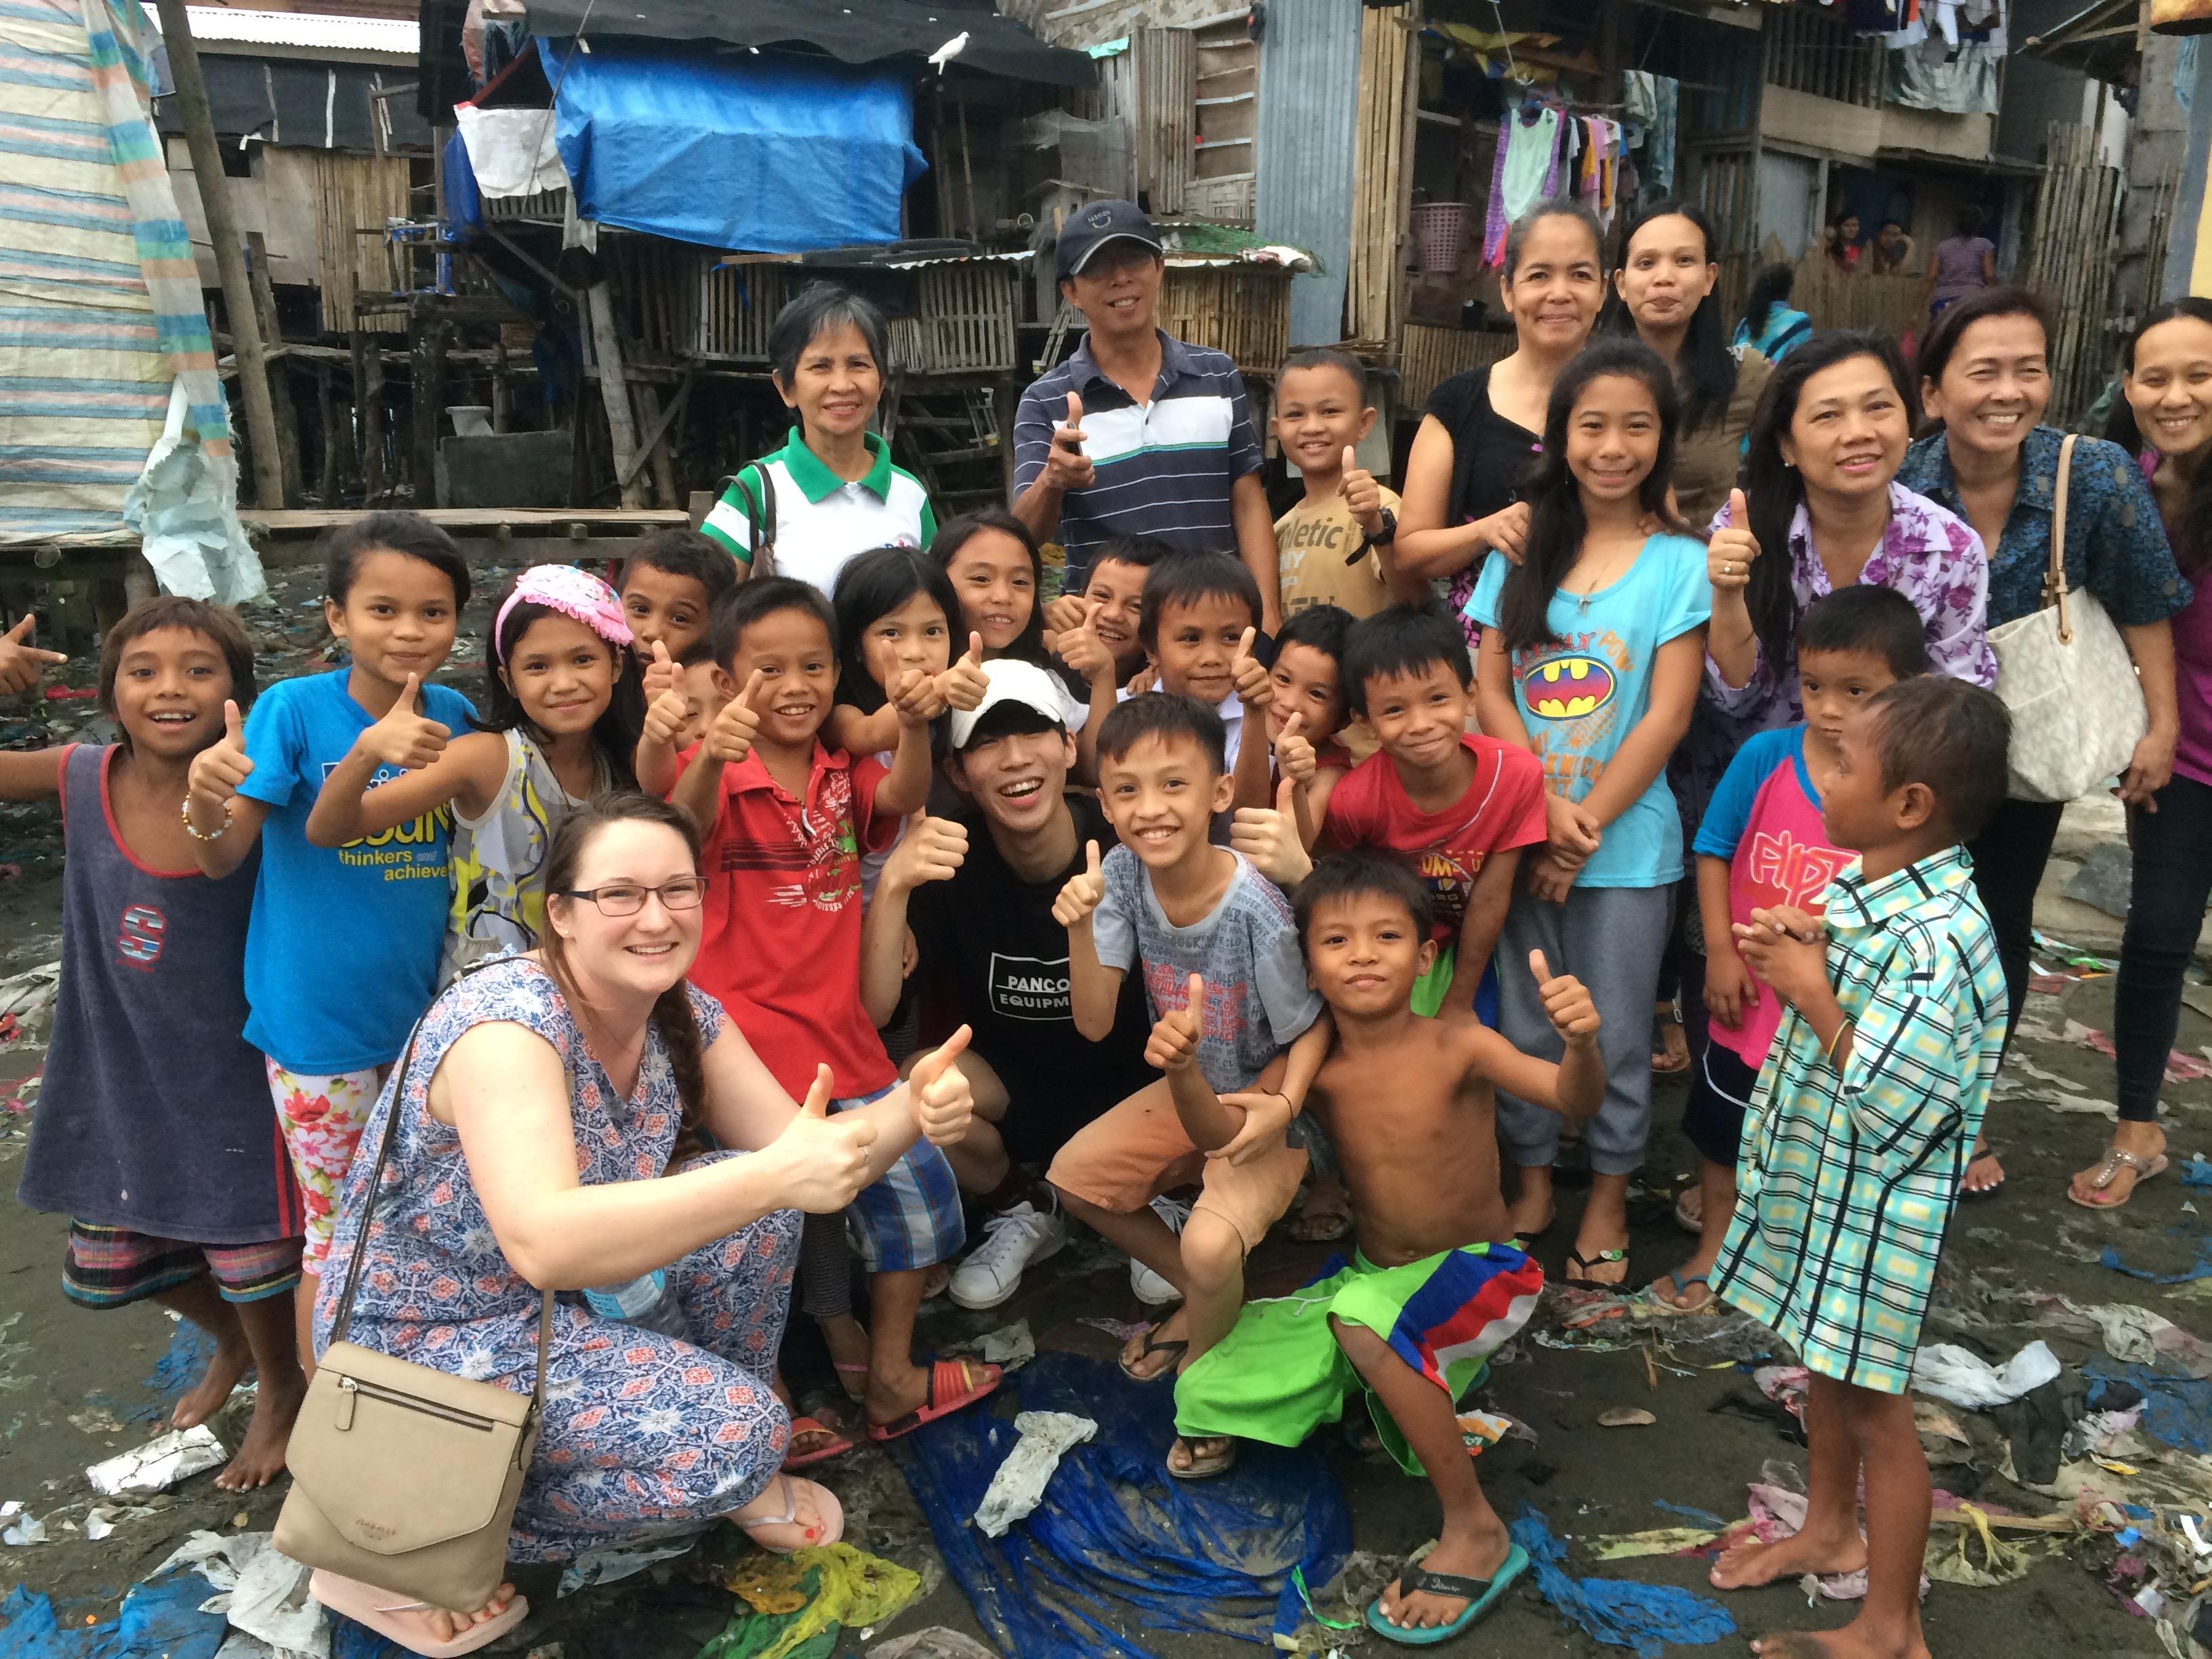 Amor Europe with street children